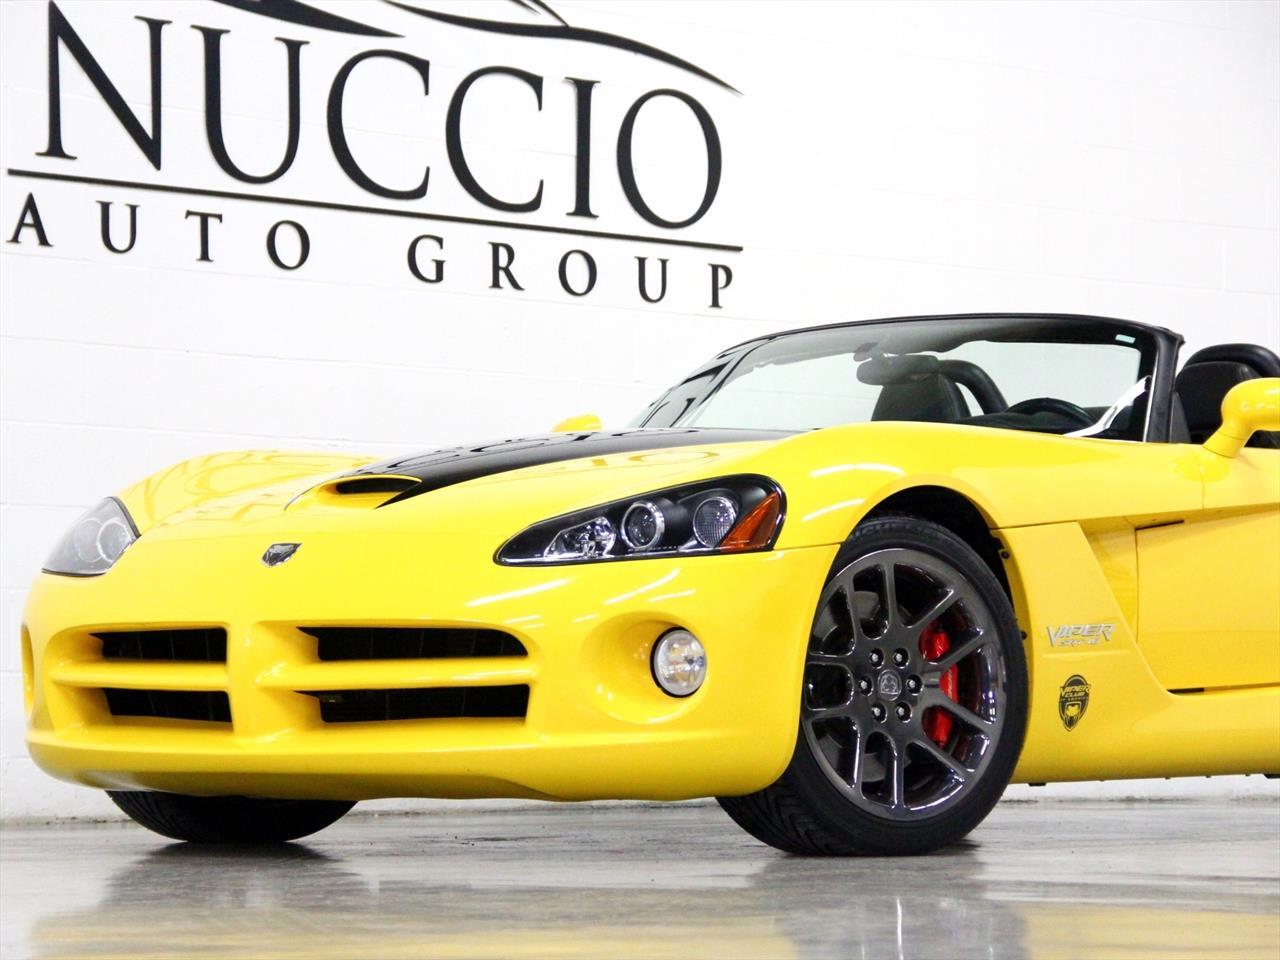 2005 Dodge Viper SRT 10 Viper Club of America Special Edition